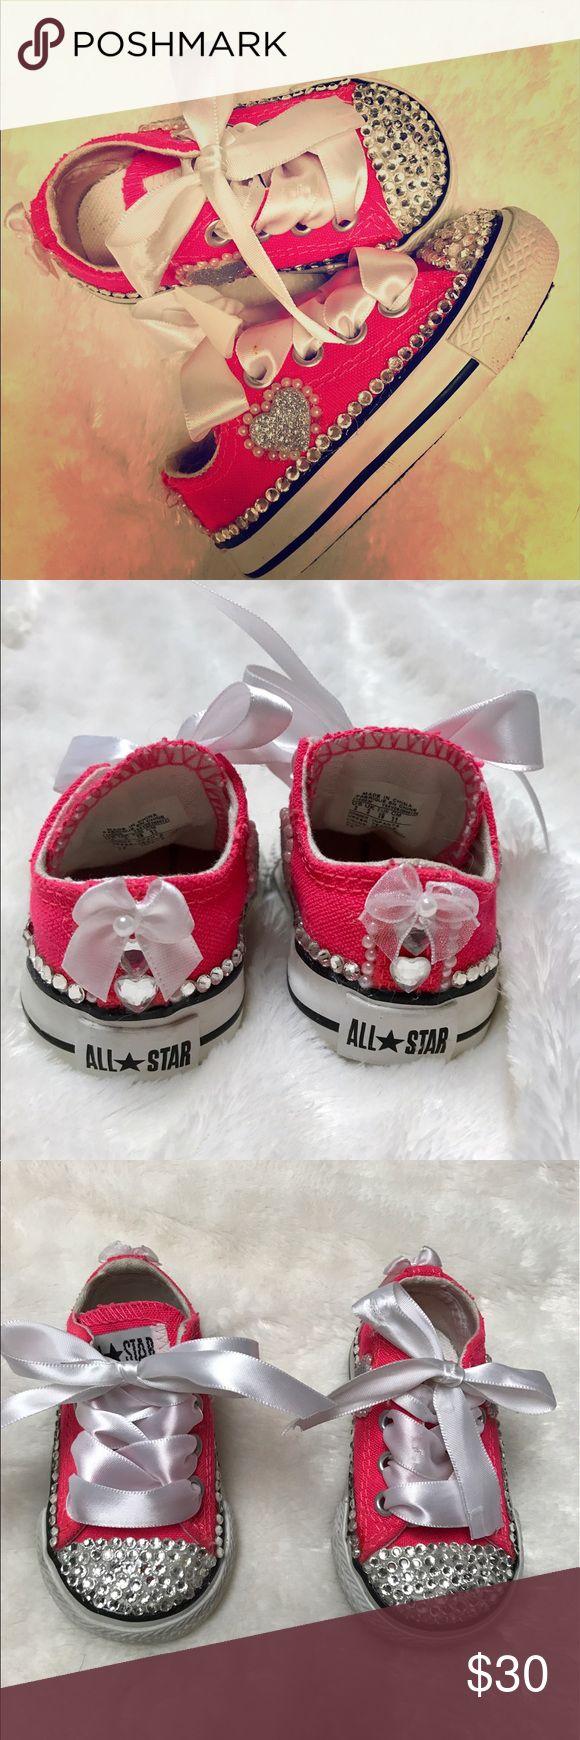 Converse Neon pink infants converse size 2 Converse Shoes Baby & Walker